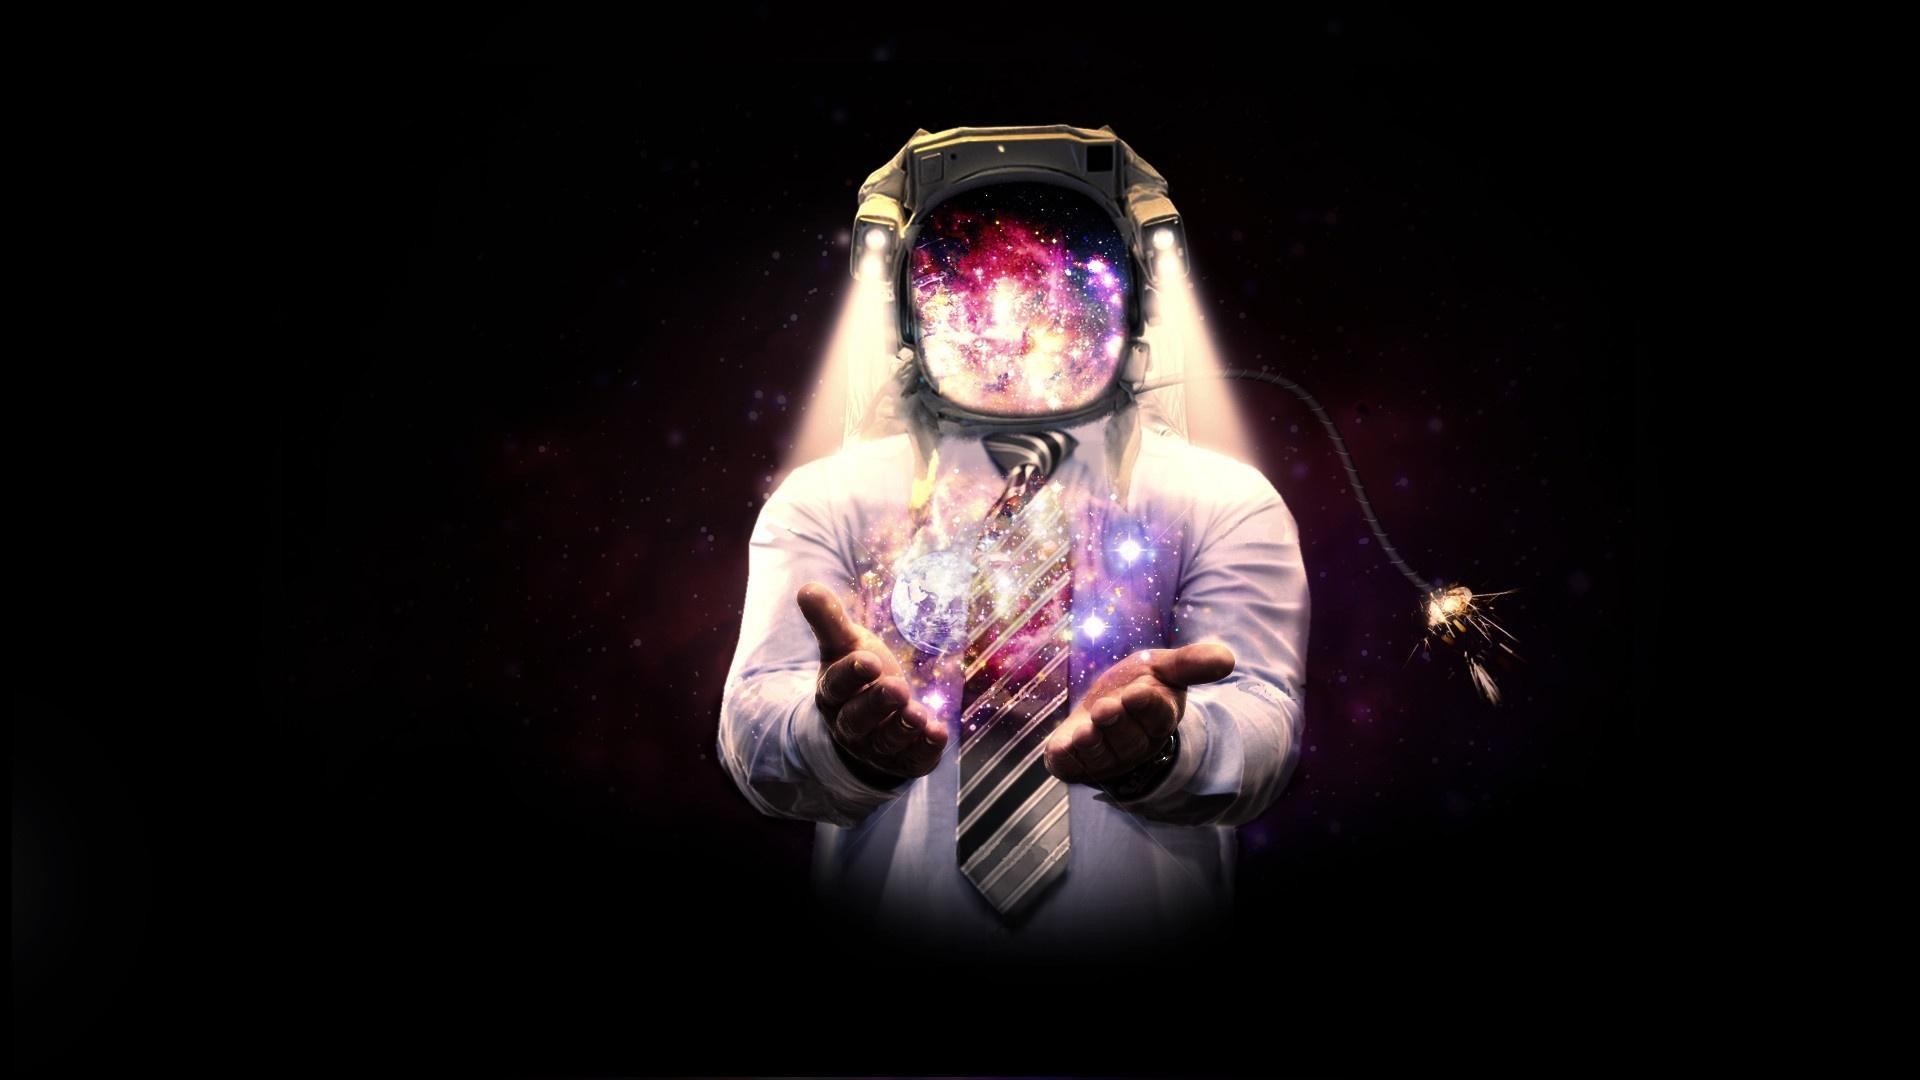 Astronaut Art Pic